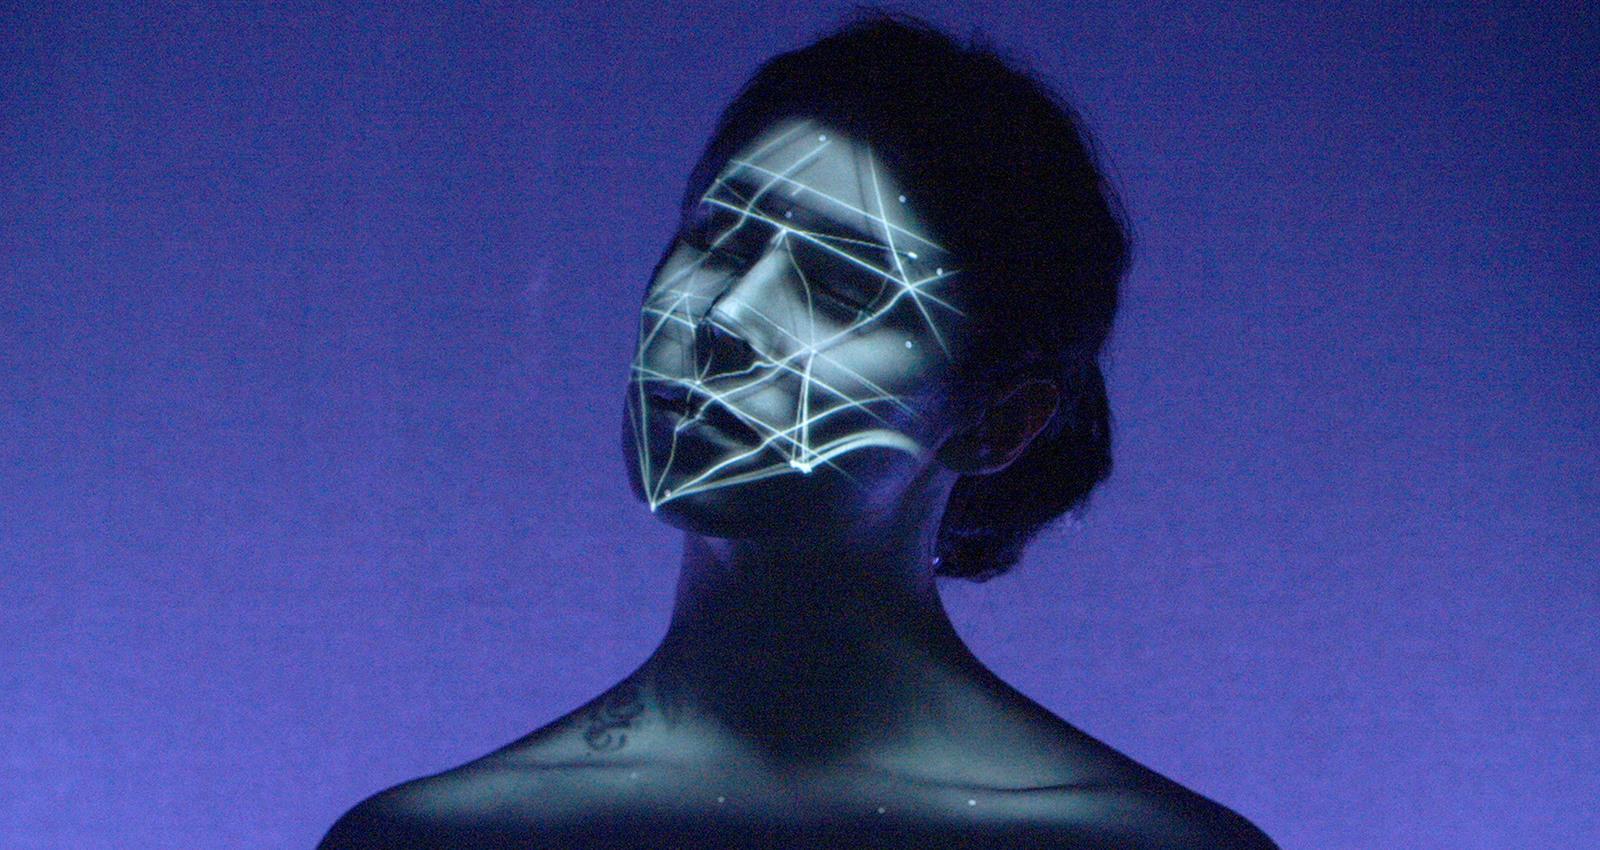 Kat Von D?s Live Face Mapping